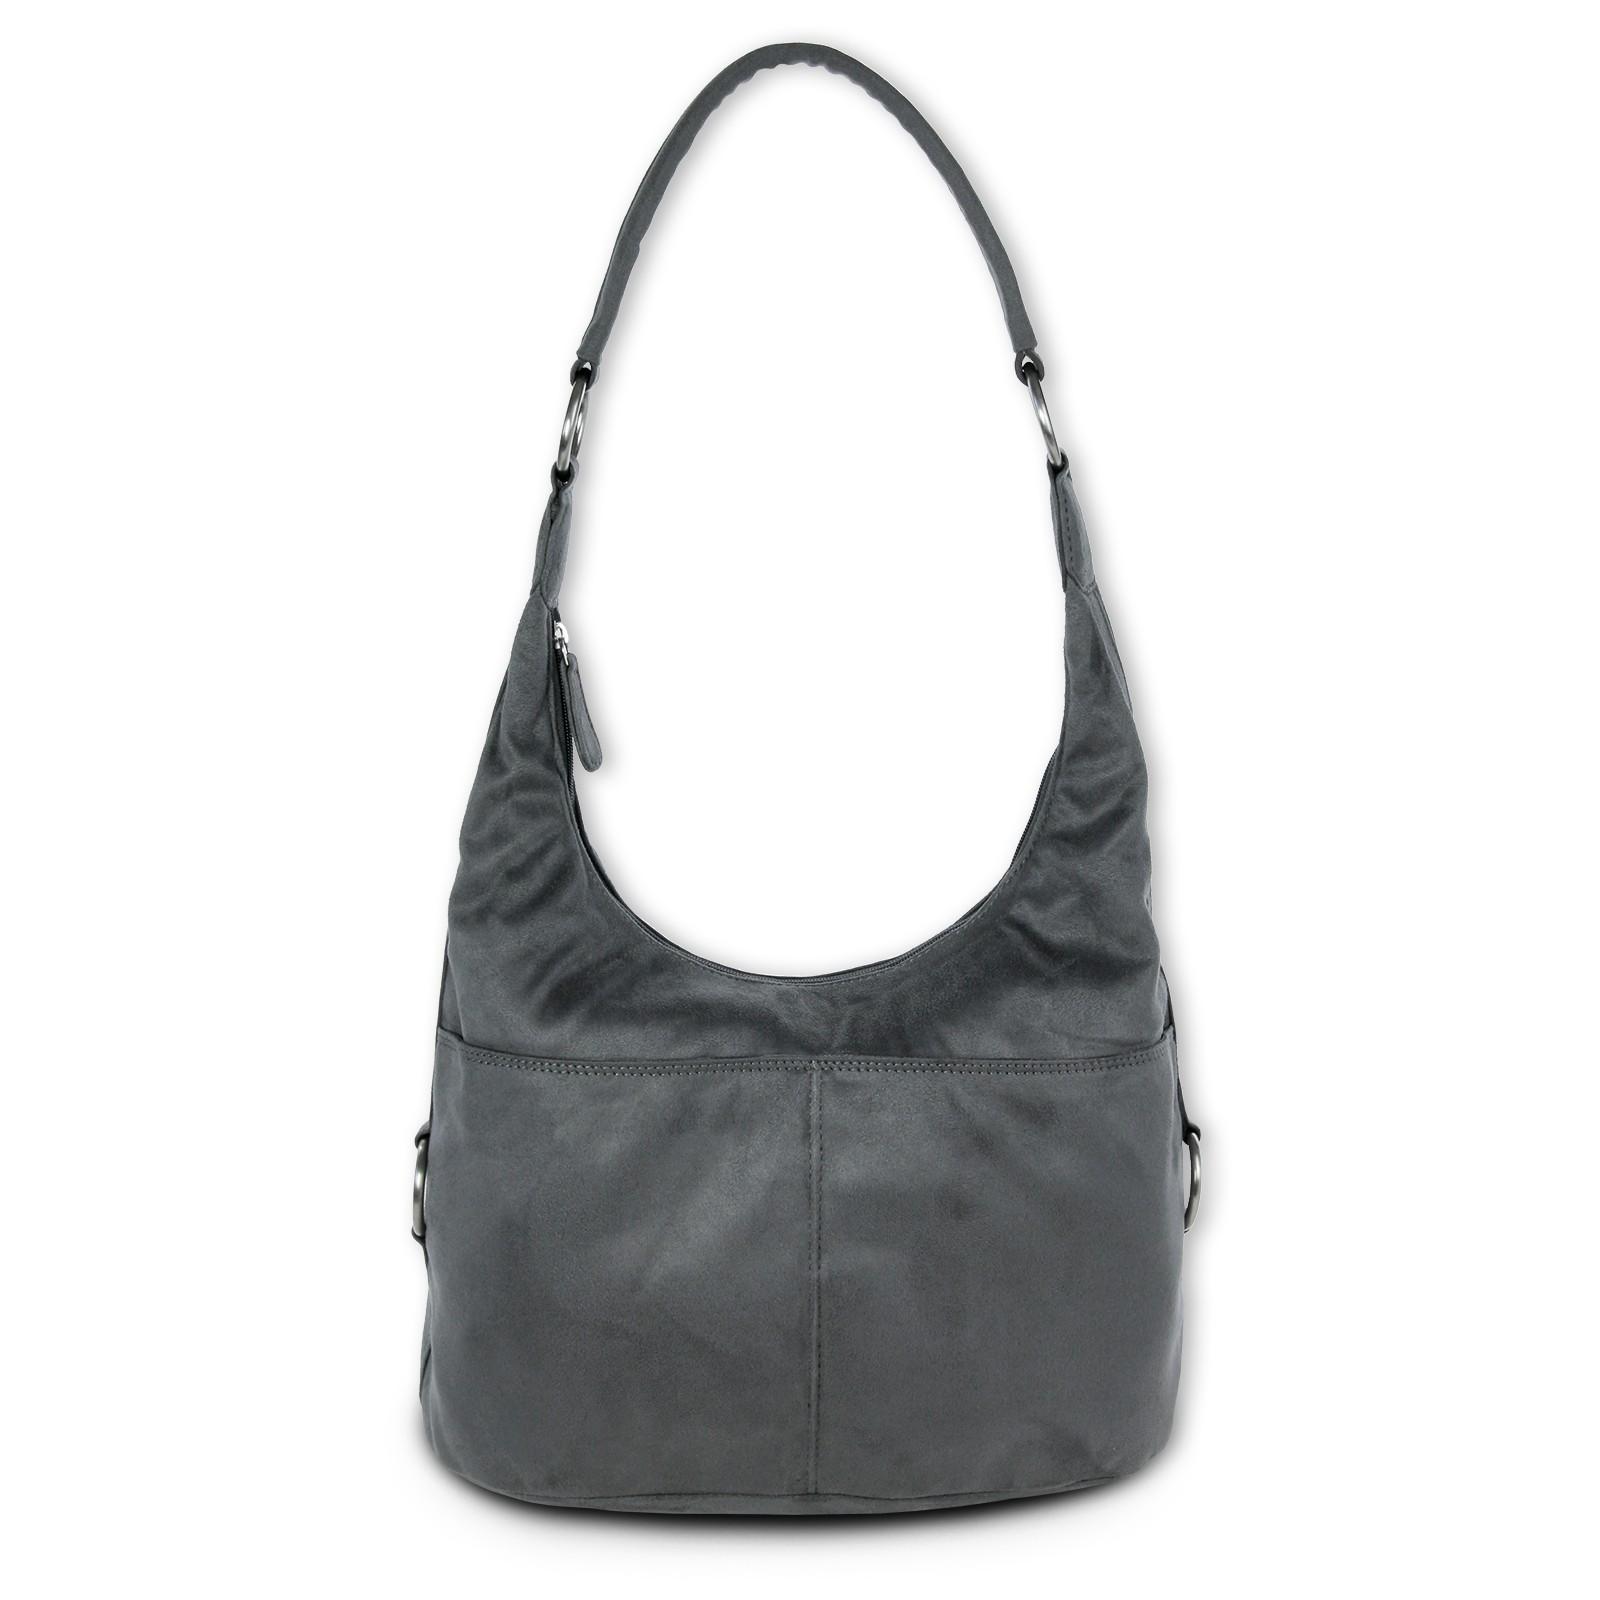 Beuteltasche Kunstleder grau Hobo Bag Damen Handtasche DrachenLeder OTS100K